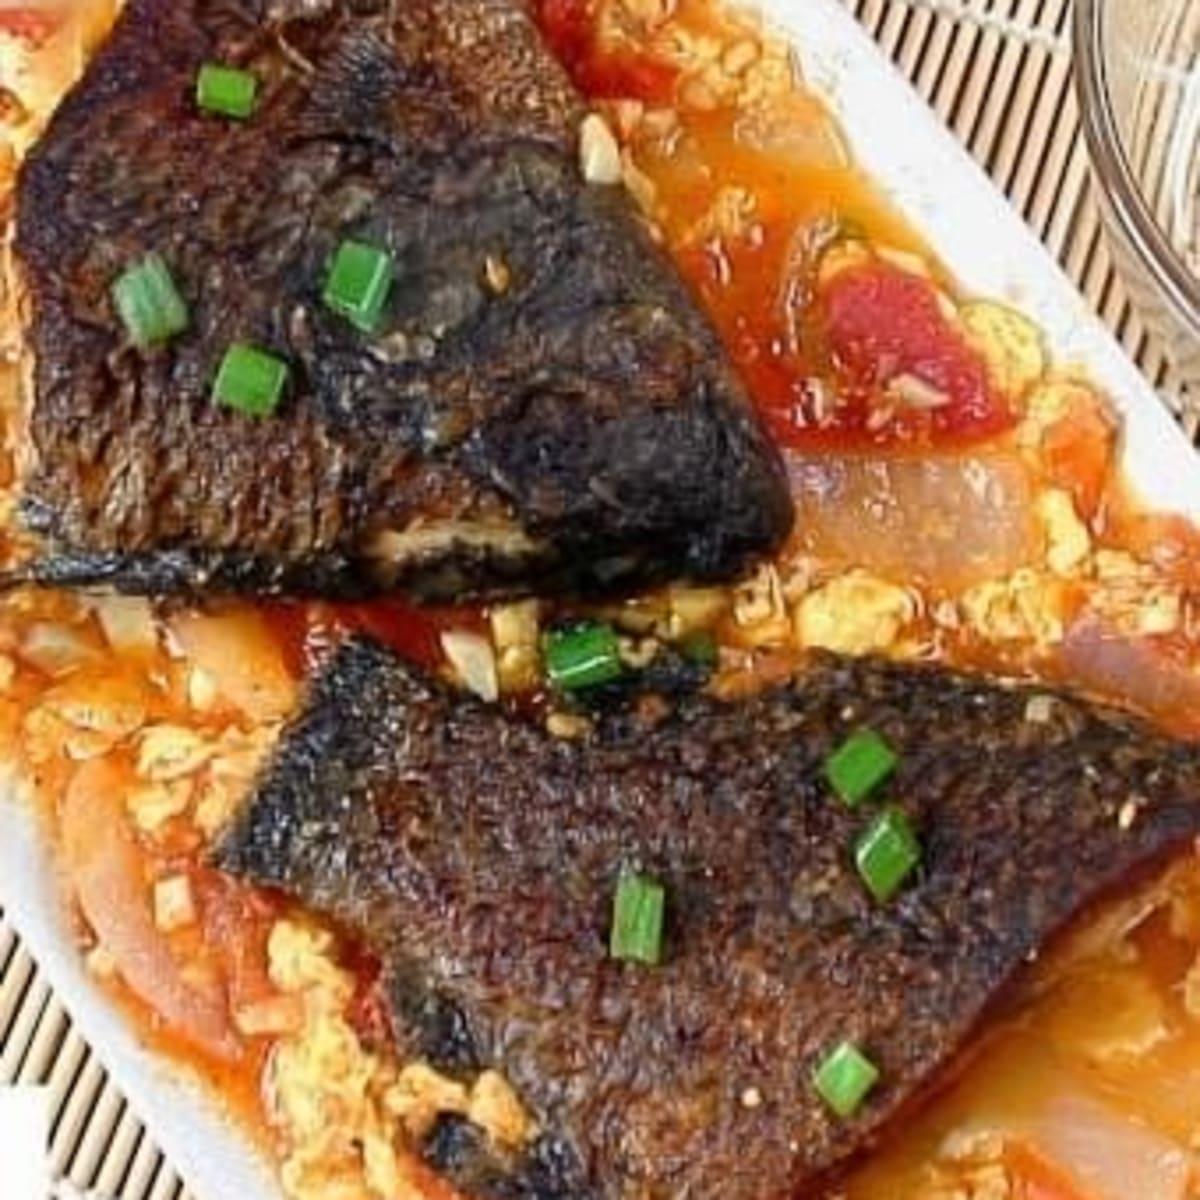 Sarciadong Isda Filipino Fish Stew With Tomato Sauce Delishably Food And Drink